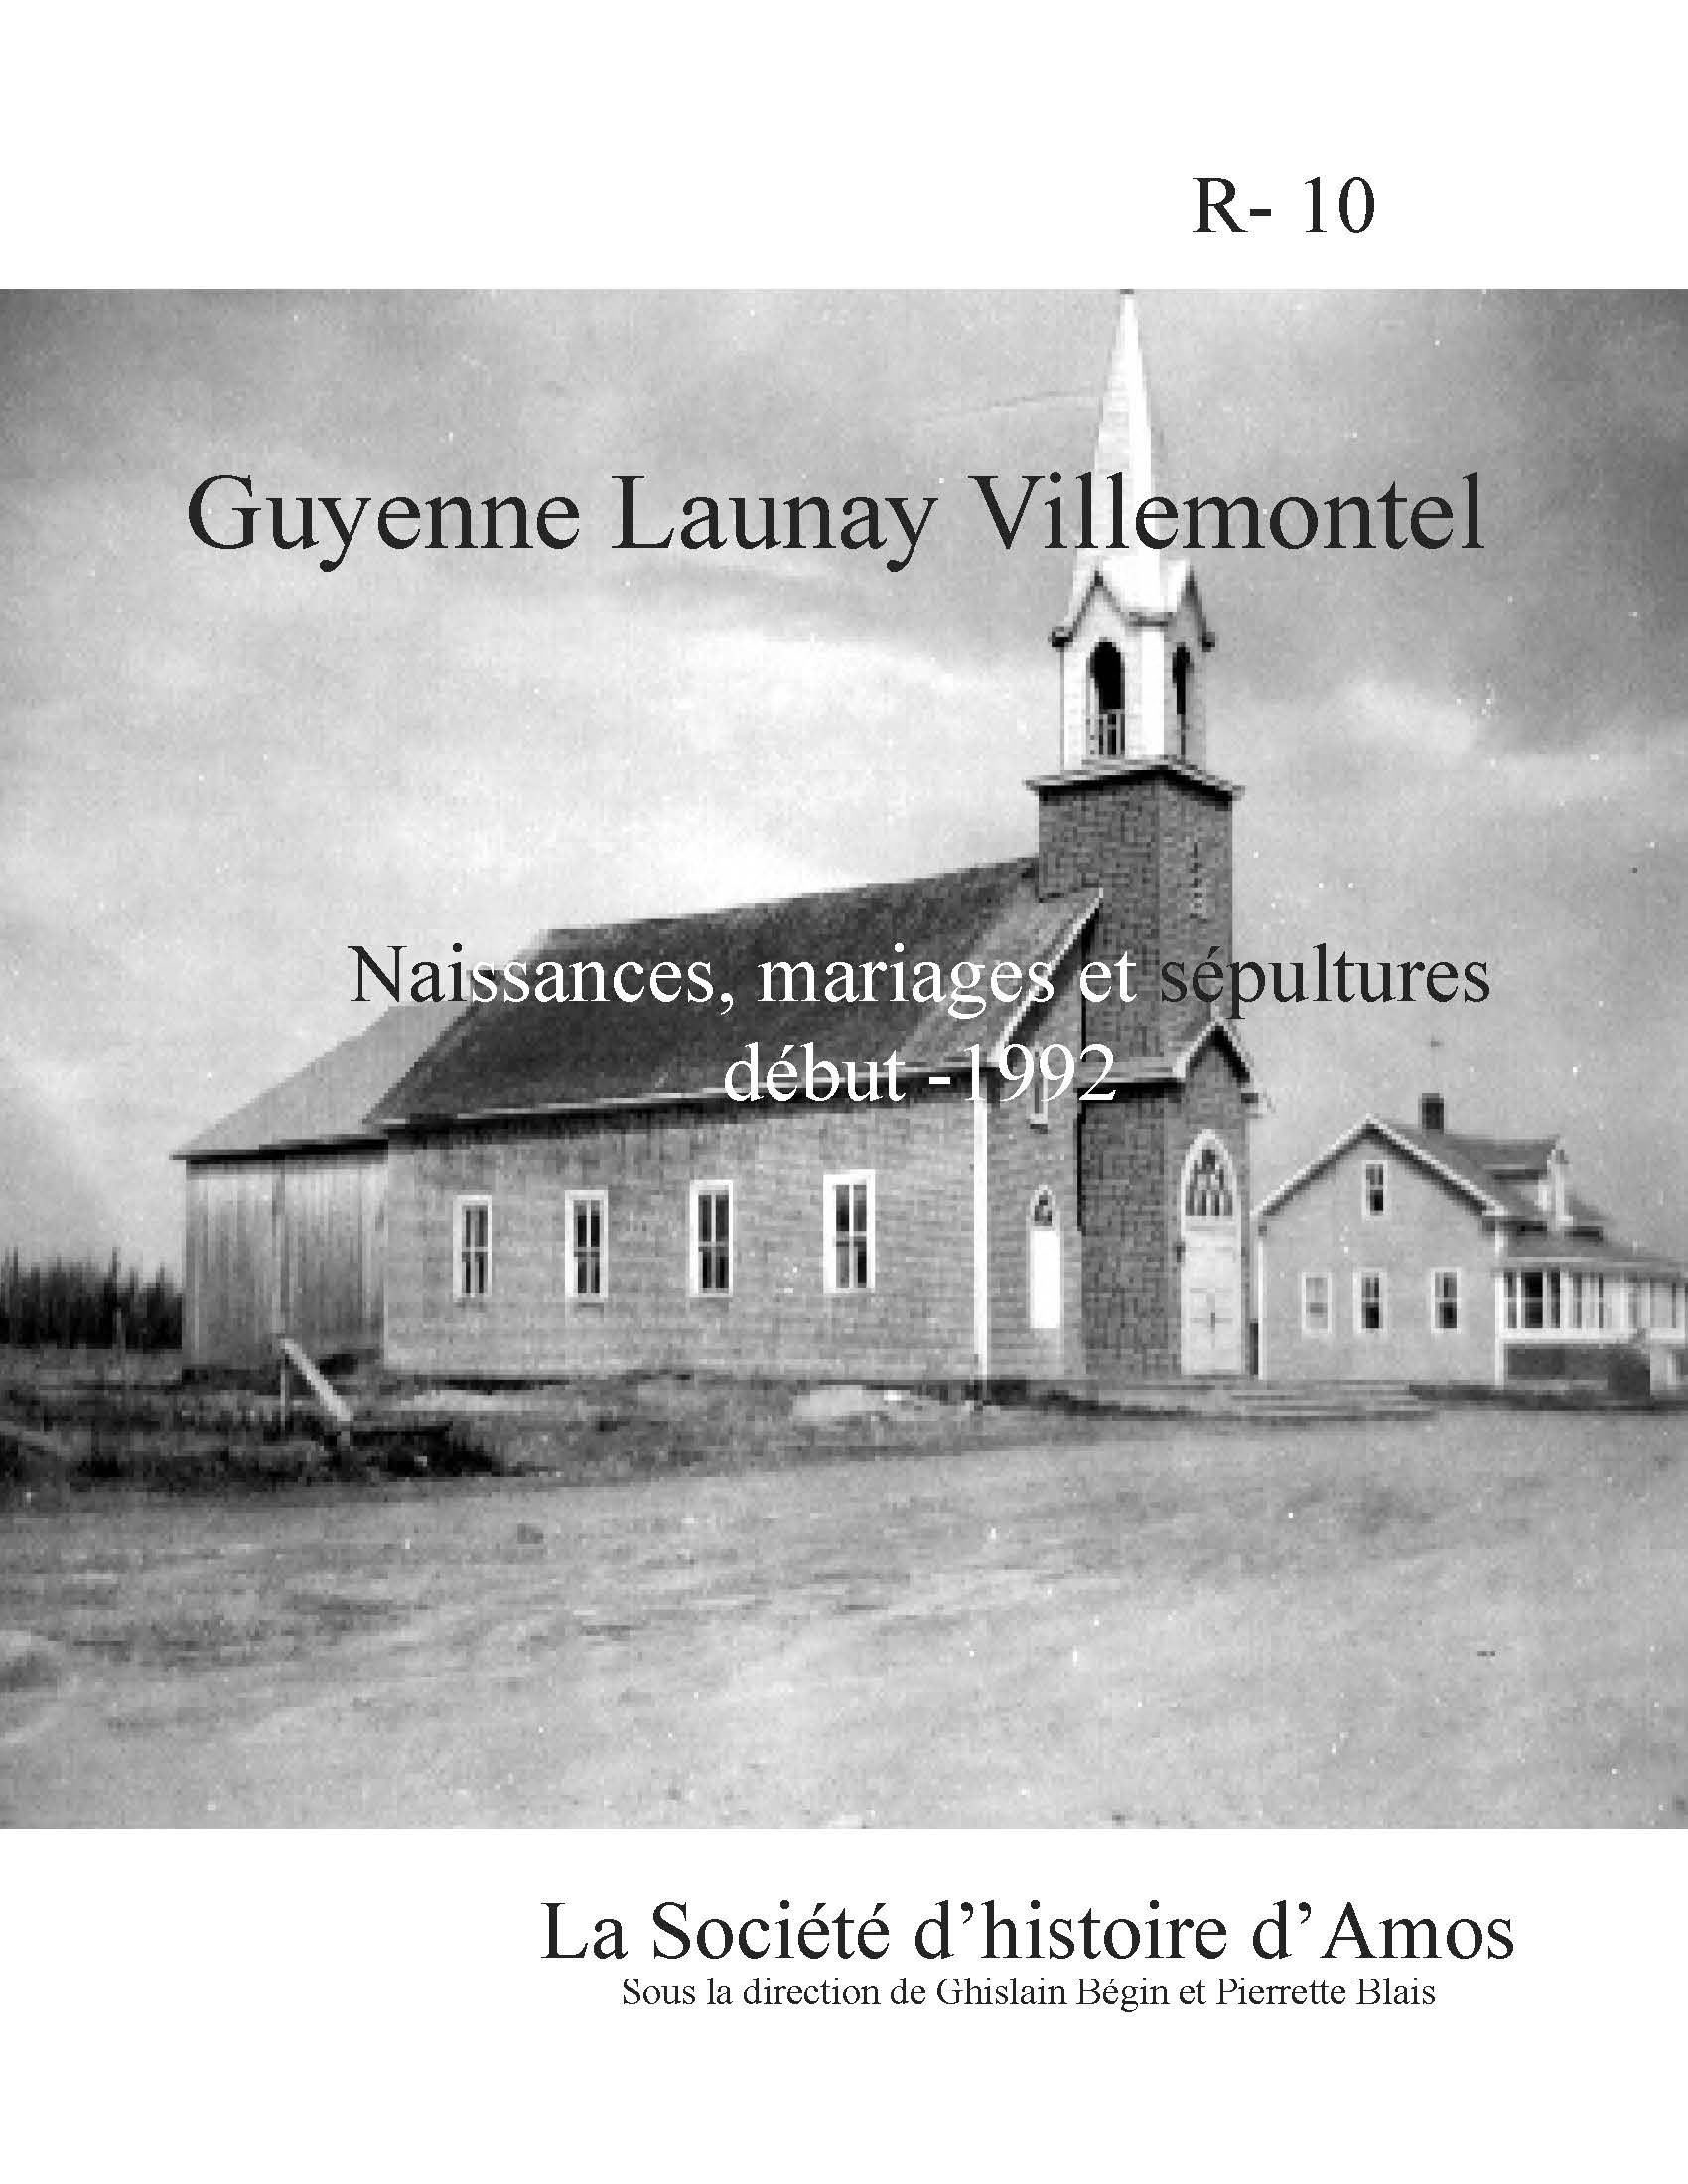 R-10 Guyenne – Launay – Villemontel (BMS)